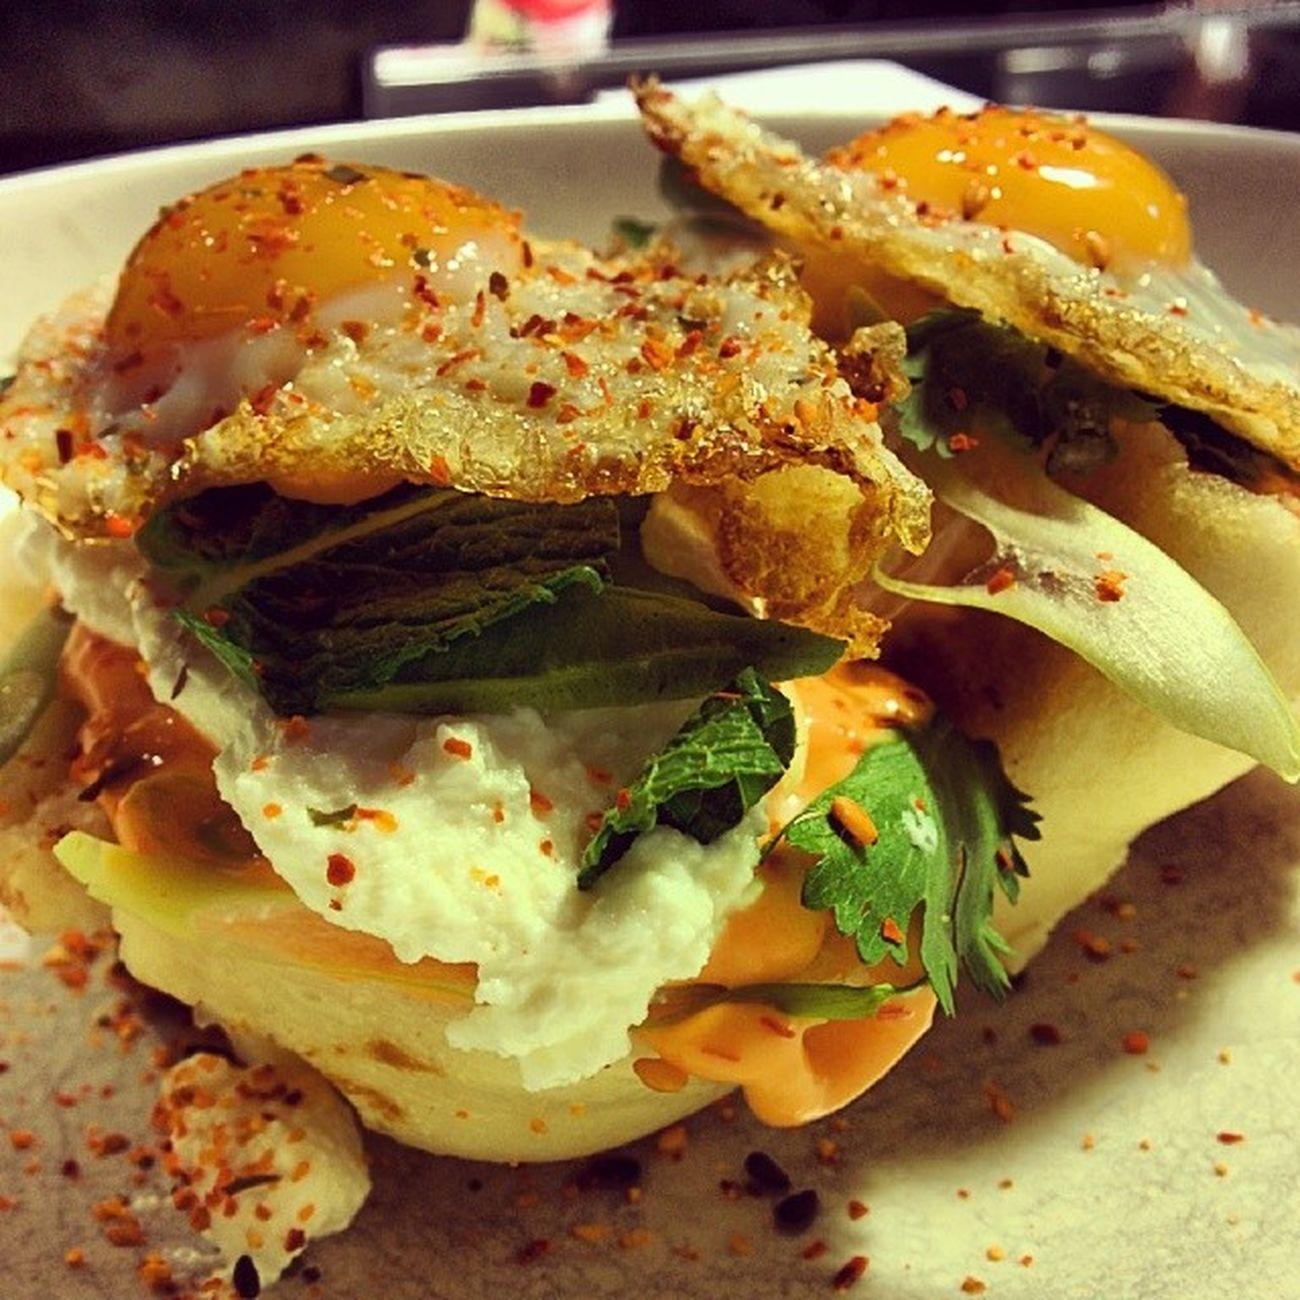 Sandwich club según StreetXO! Ricota, huevo frito de codorniz y sichimi-togarashi. Bueno, muy bueno. Sandwich Aitoespanja